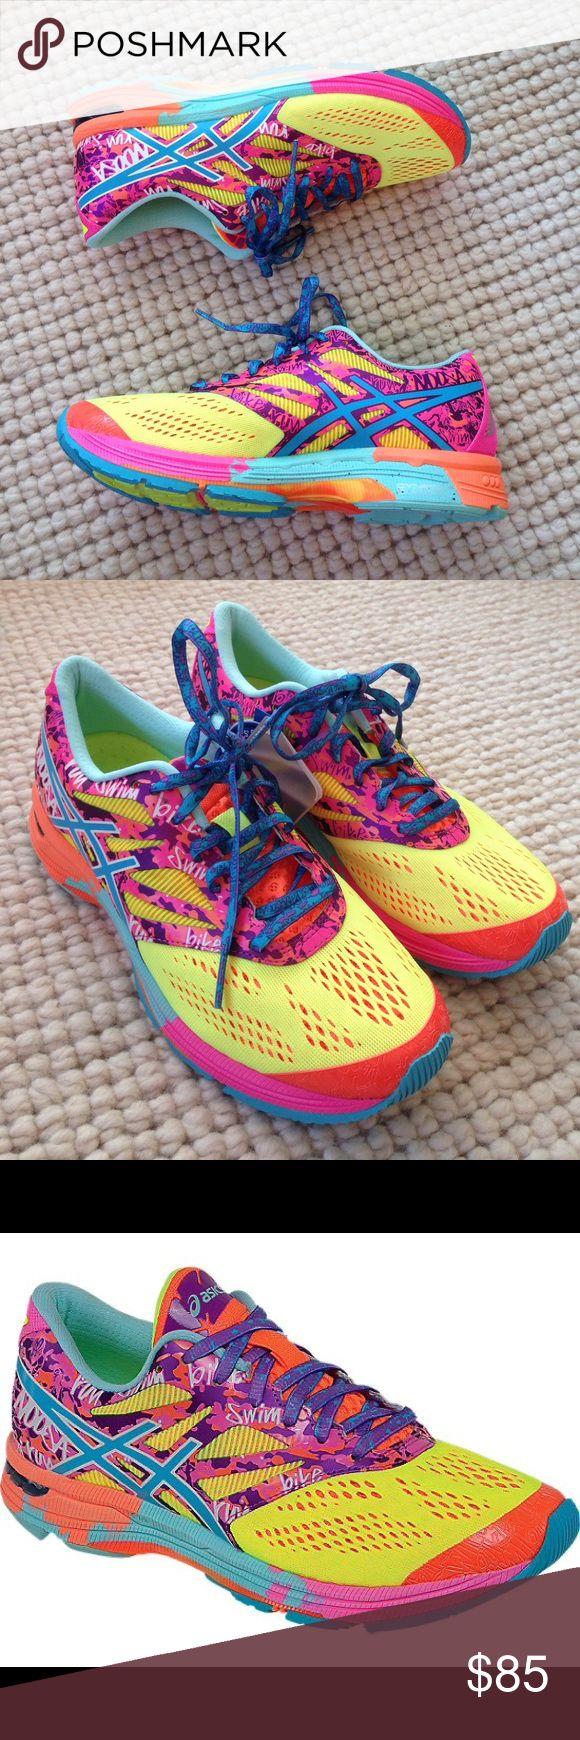 NWT! Asics Gel-Noosa Tri 10 Running Shoe 7.5 NWT! Asics Gel-Noosa Tri 10 Running Shoe. Size Women's 7.5. Asics Shoes Athletic Shoes